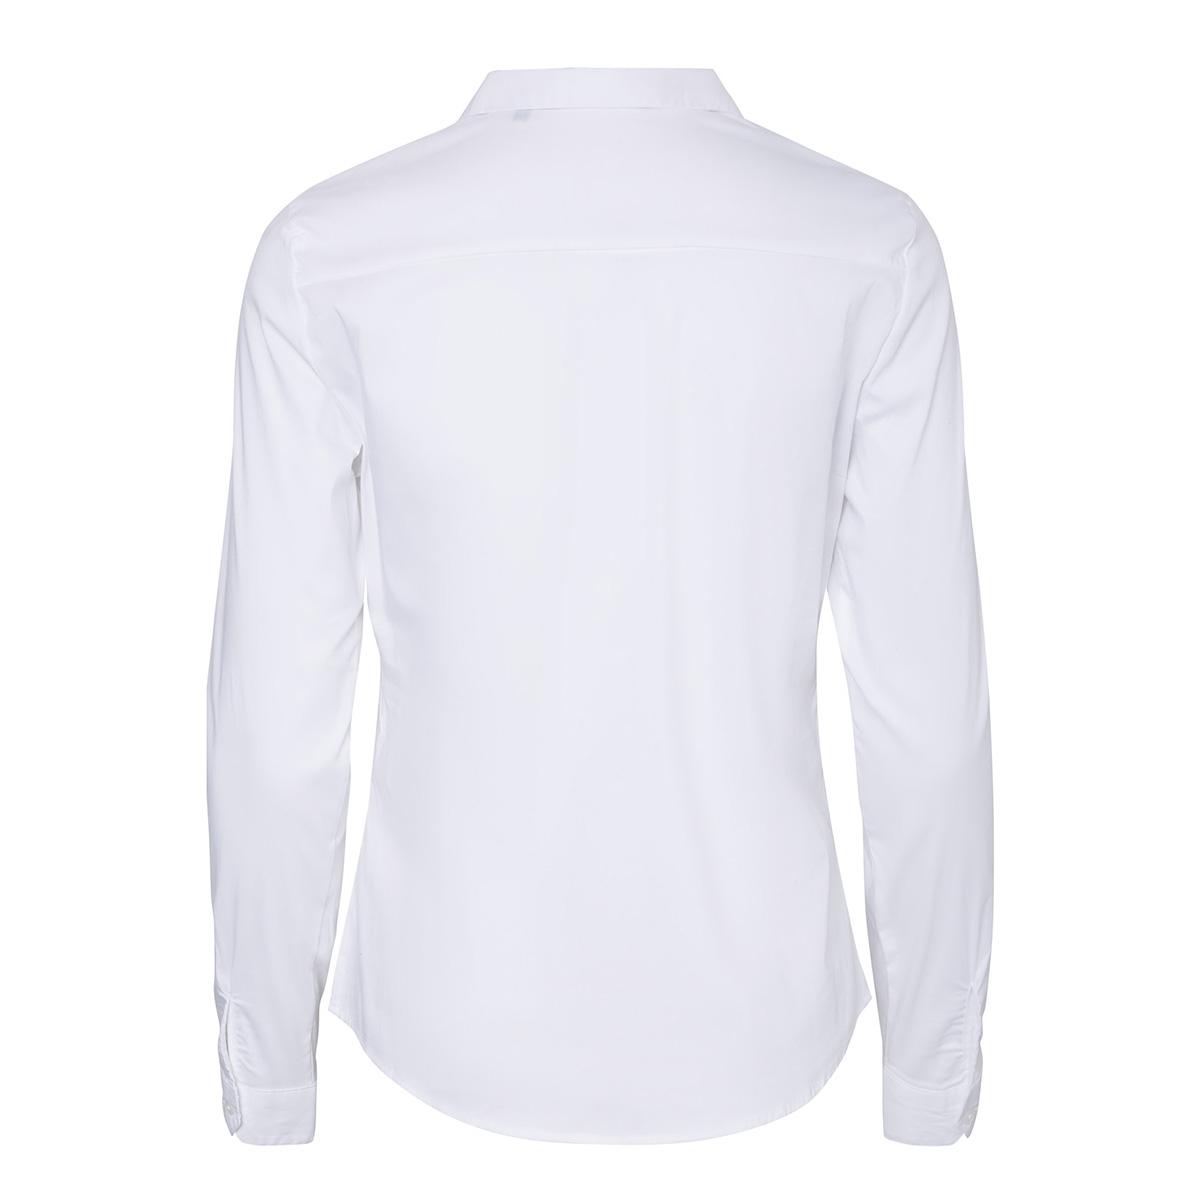 vmisabella l/s shirt noos 10188822 vero moda blouse bright white